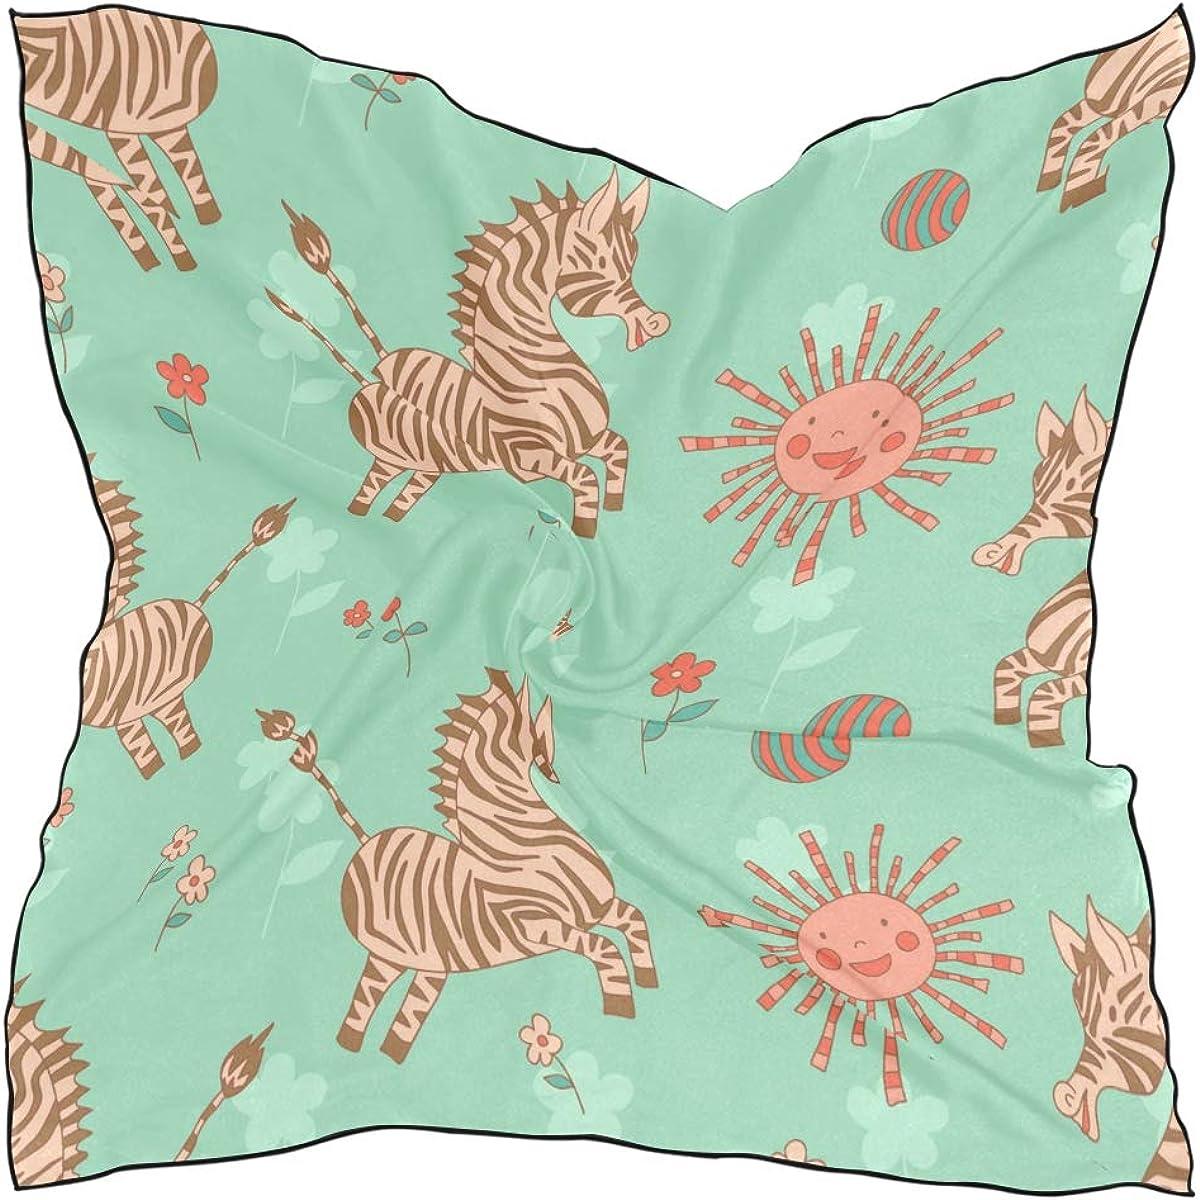 Soft Polyester Silk Head Scarf Lightweight Fashion Print Zebra Animal Wild Life Scarves Head Light Square Scarf Ladies Square Scarves Multiple Ways Of Wearing Daily Decor